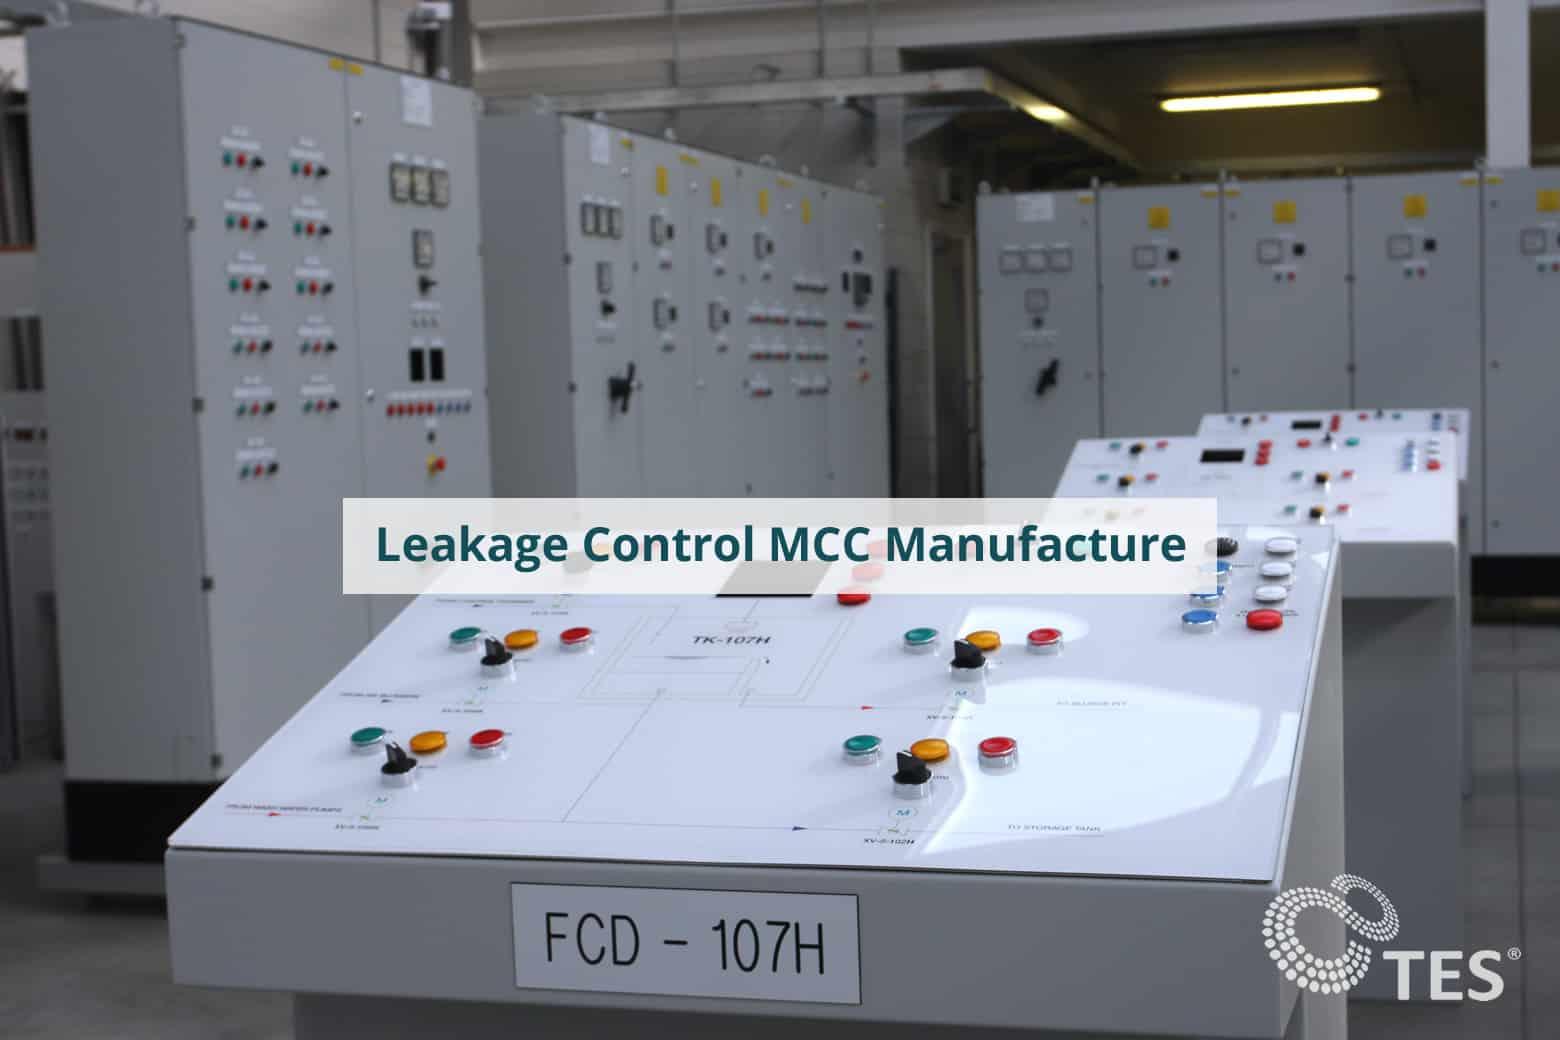 Leakage Control MCC Manufacture